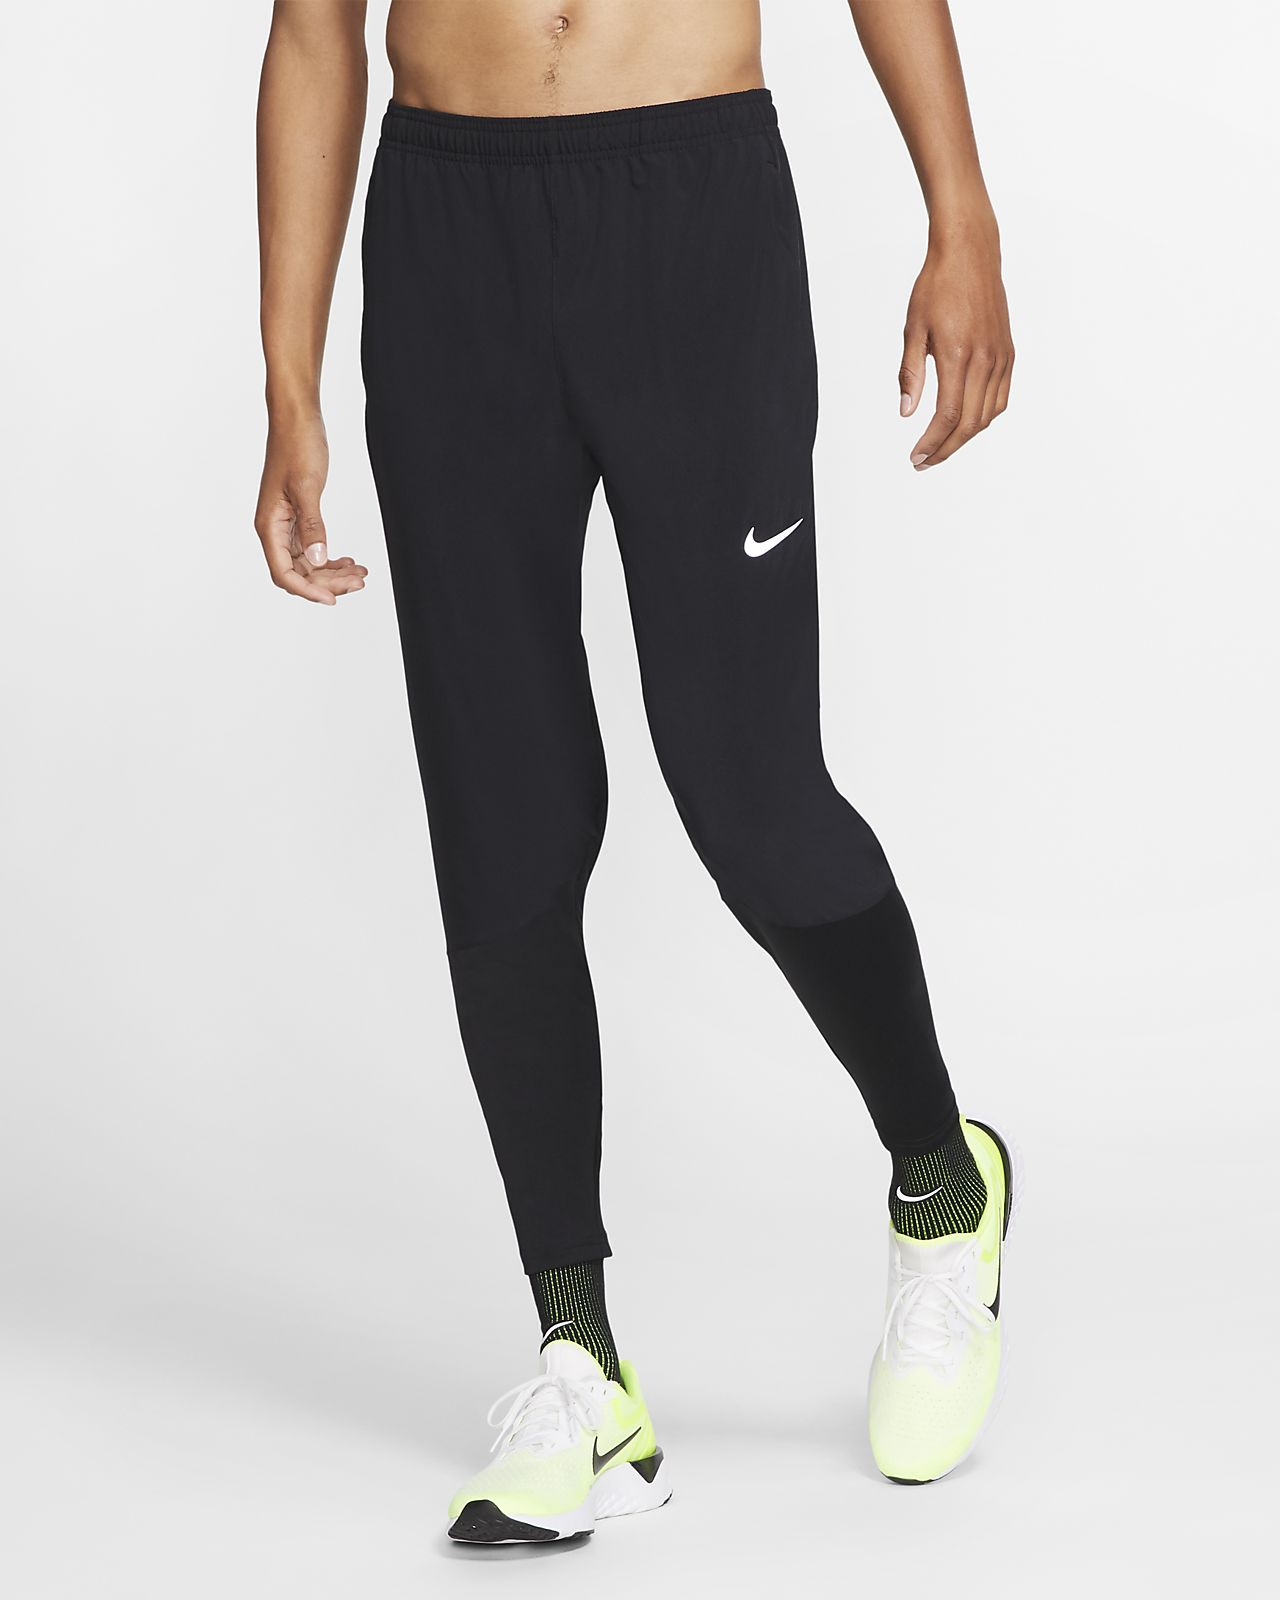 Essential Phenom Nike Herren Laufhose rQhBtsdxoC